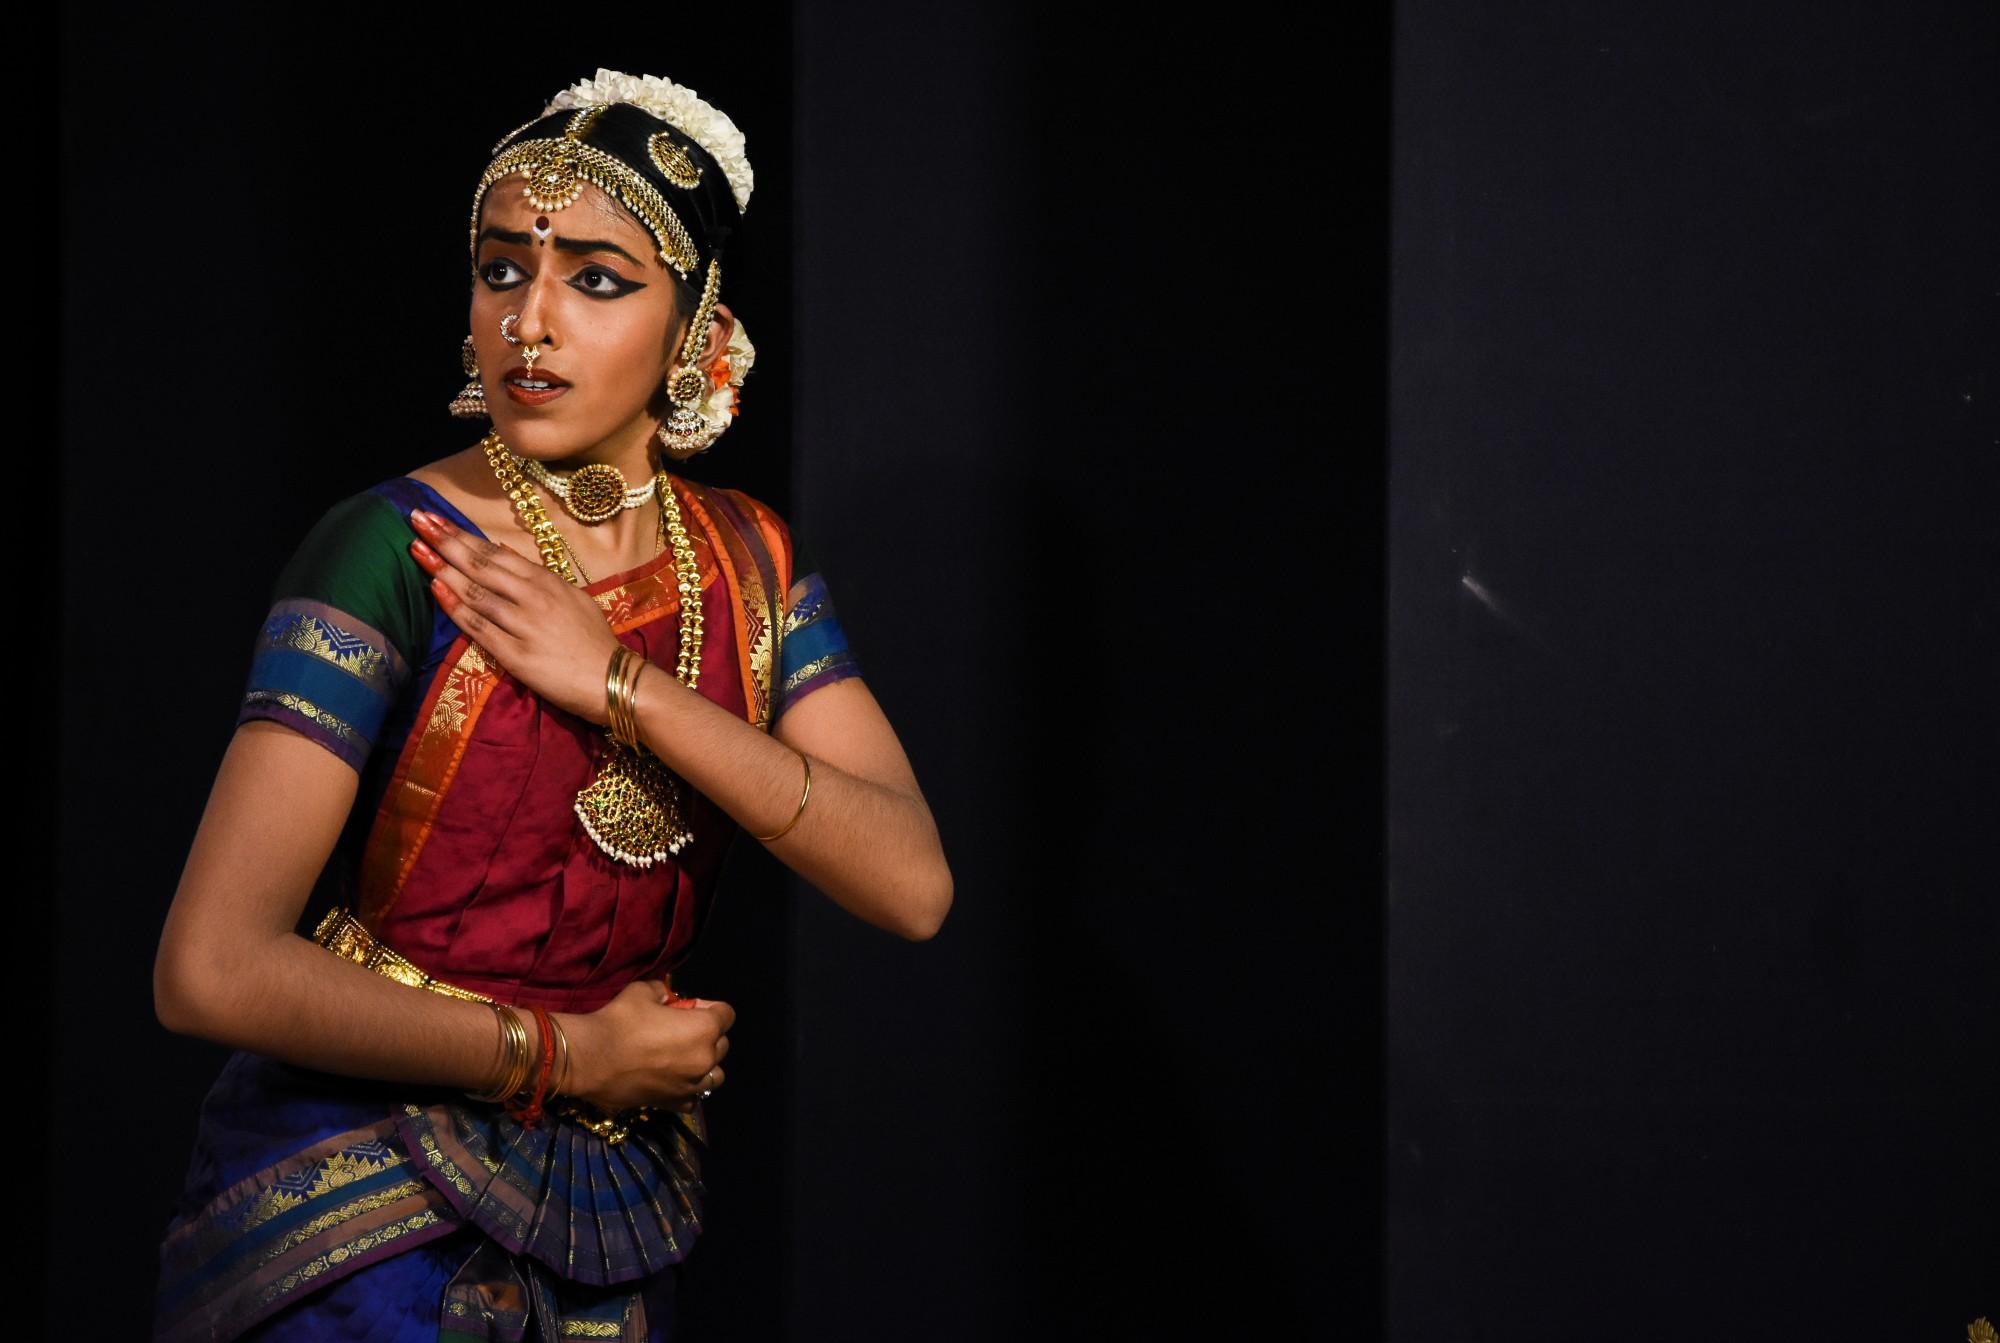 Rukshikaa Elankumaran (2019). Photo by Divakar.